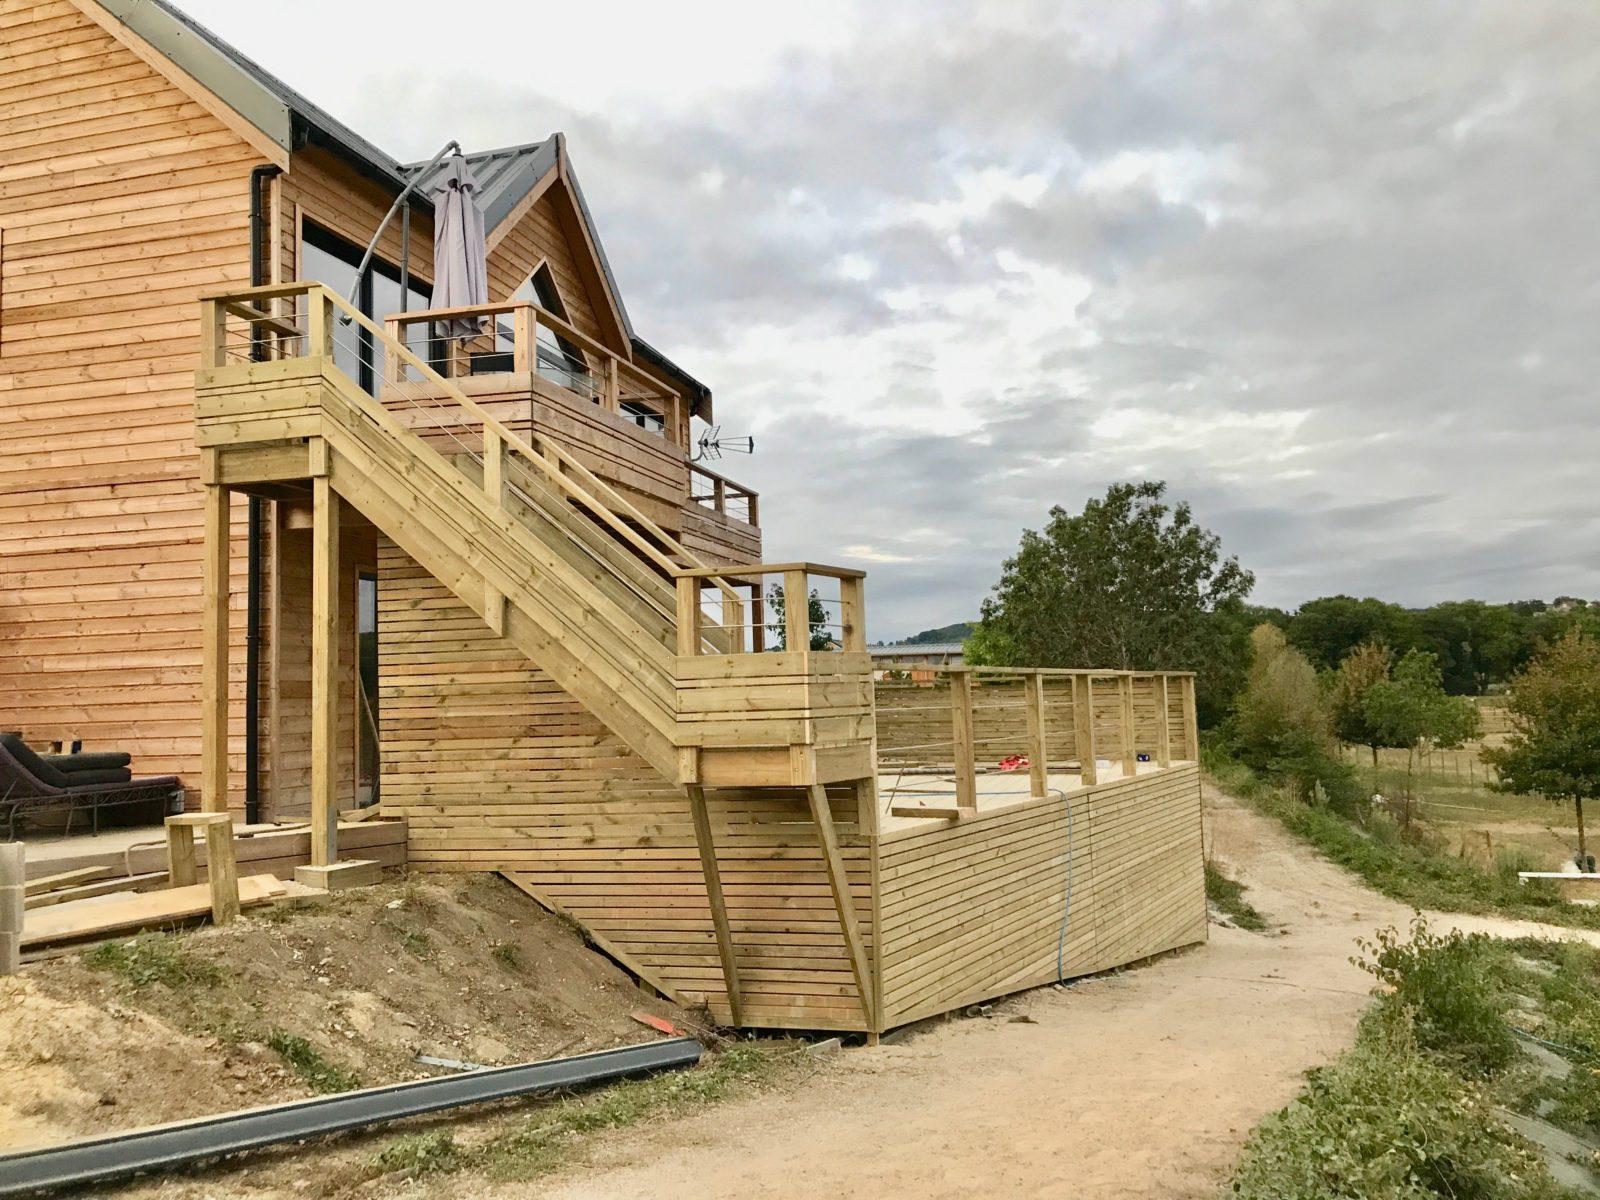 maison type ranch avec terrasse en bois